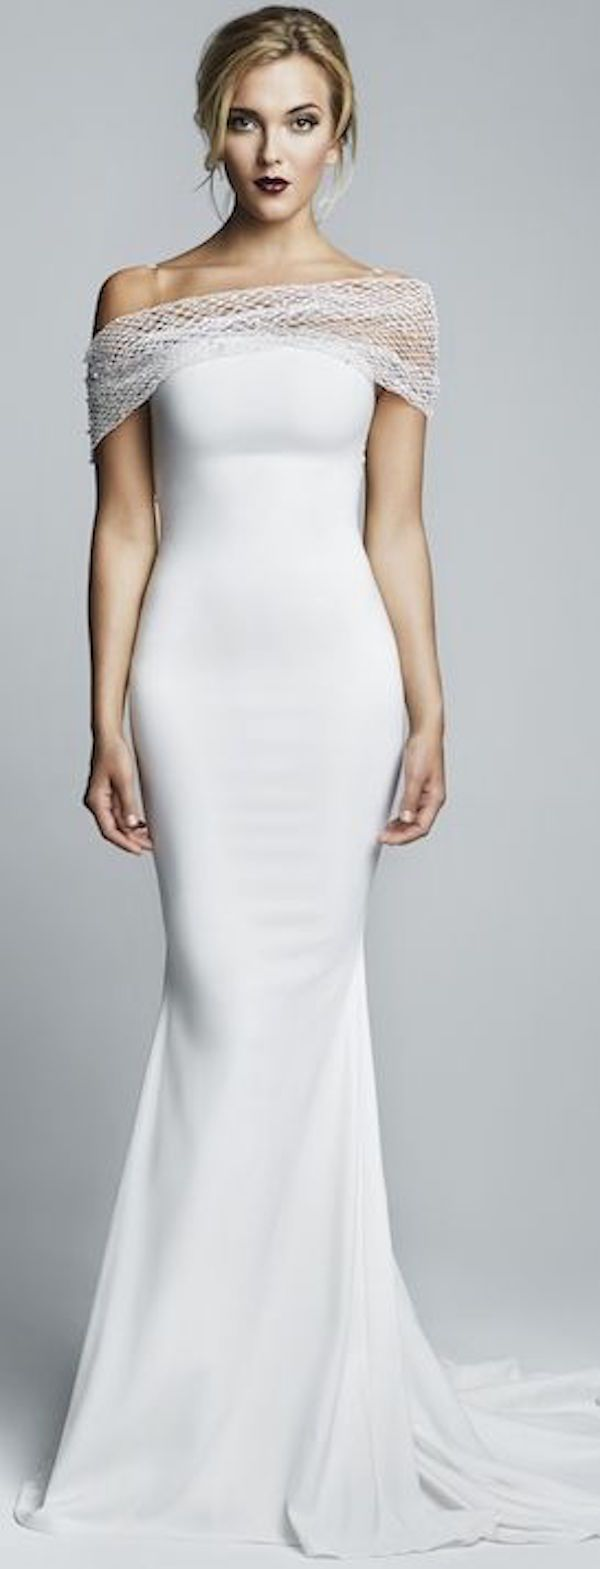 1000 ideas about sheath wedding dresses on pinterest for Sheath wedding dress body type